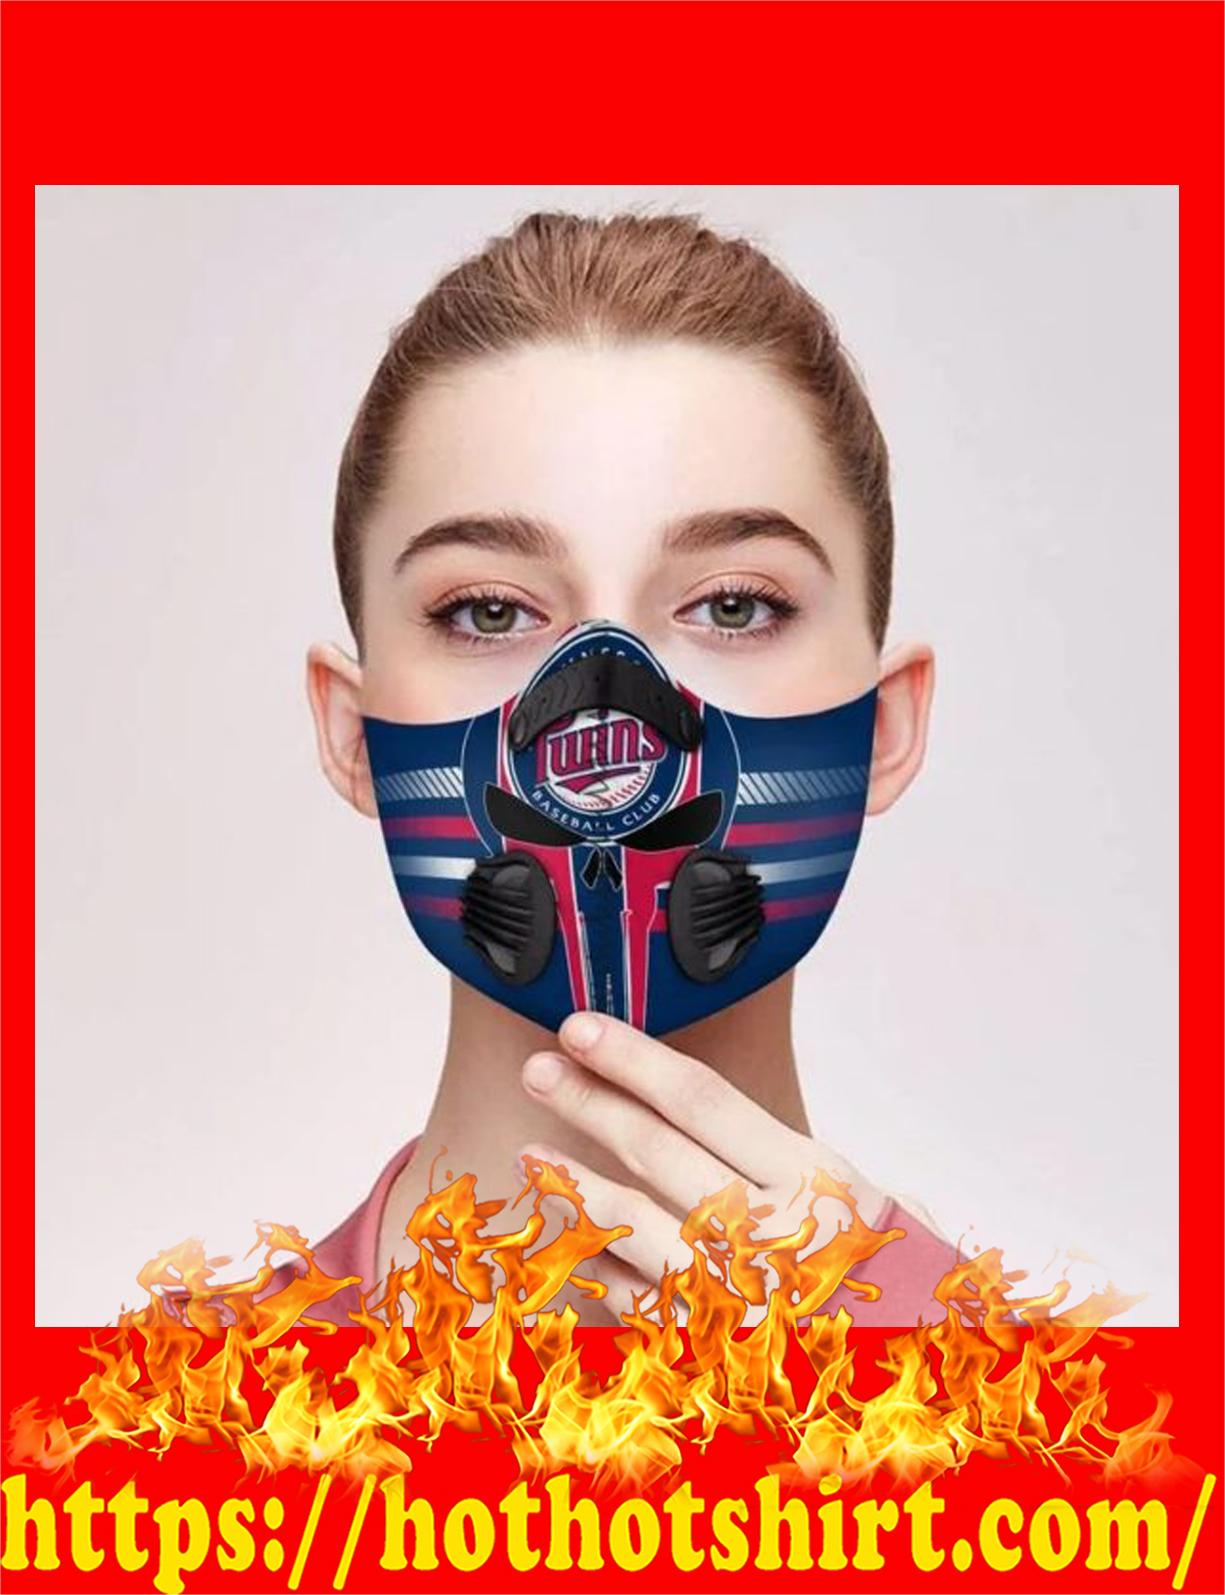 Minnesota twins punisher skull filter face mask - detail